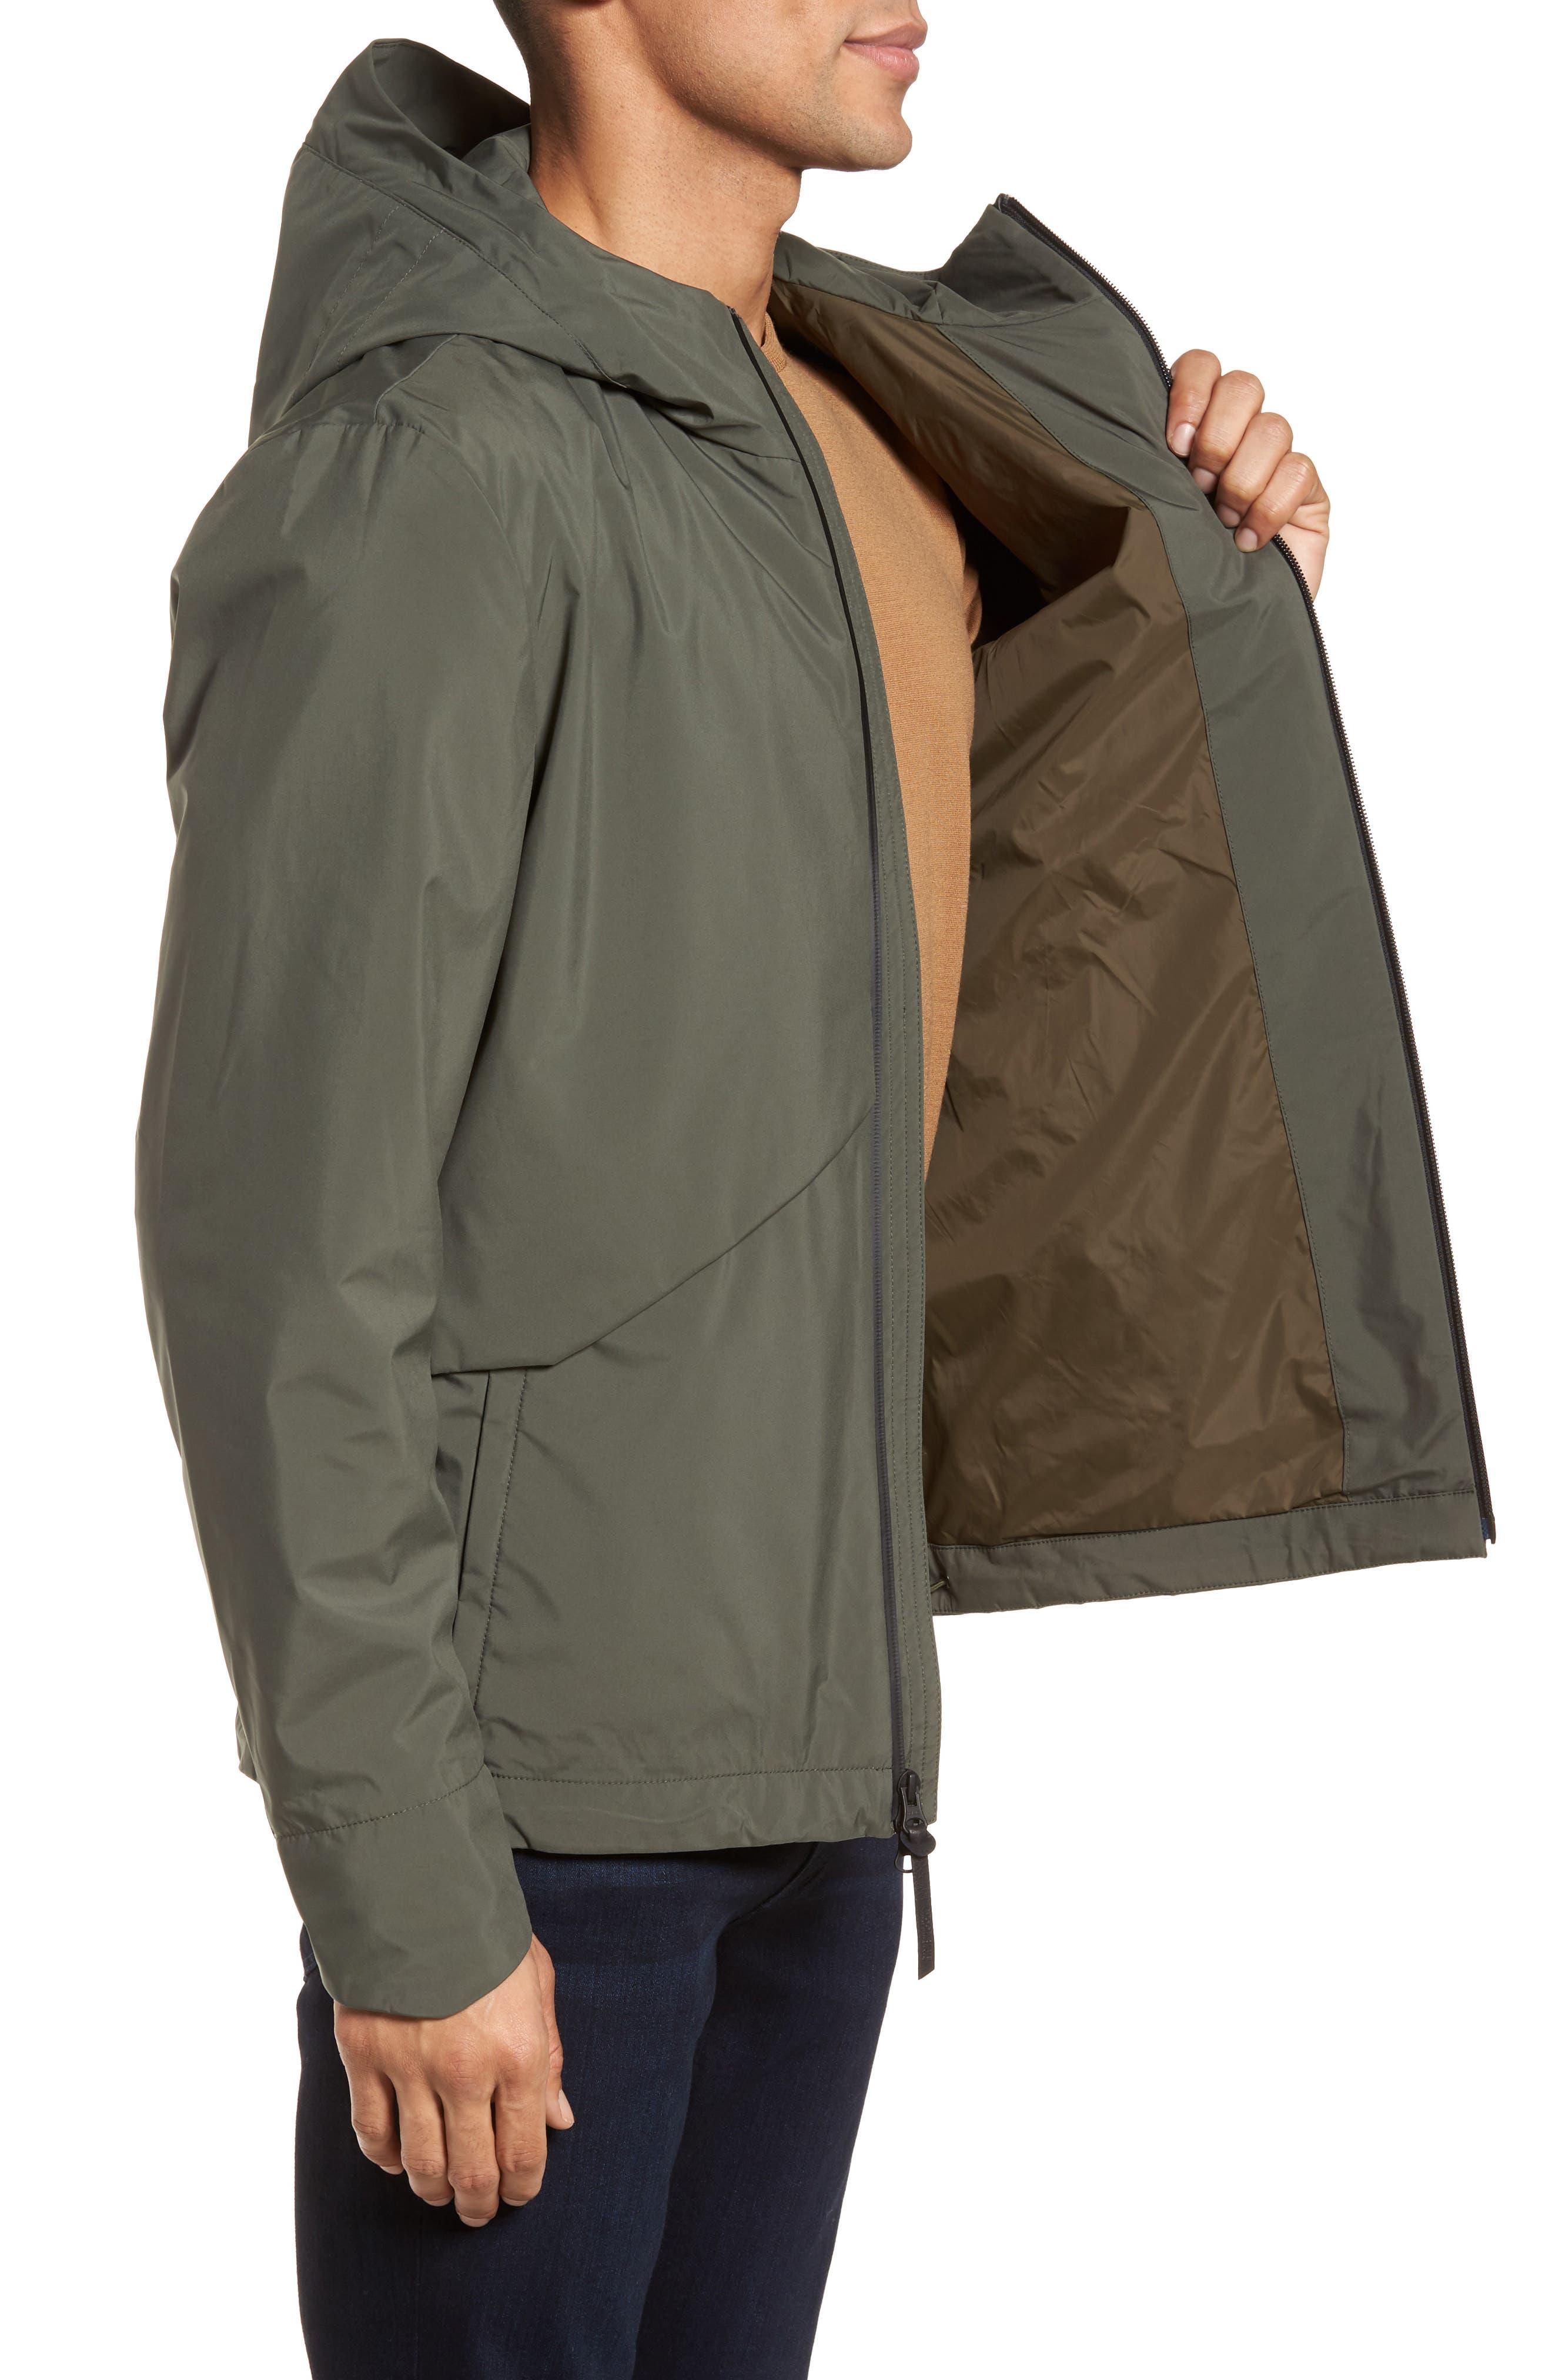 & Bros. Navigator Field Jacket,                             Alternate thumbnail 3, color,                             Grape Leaf